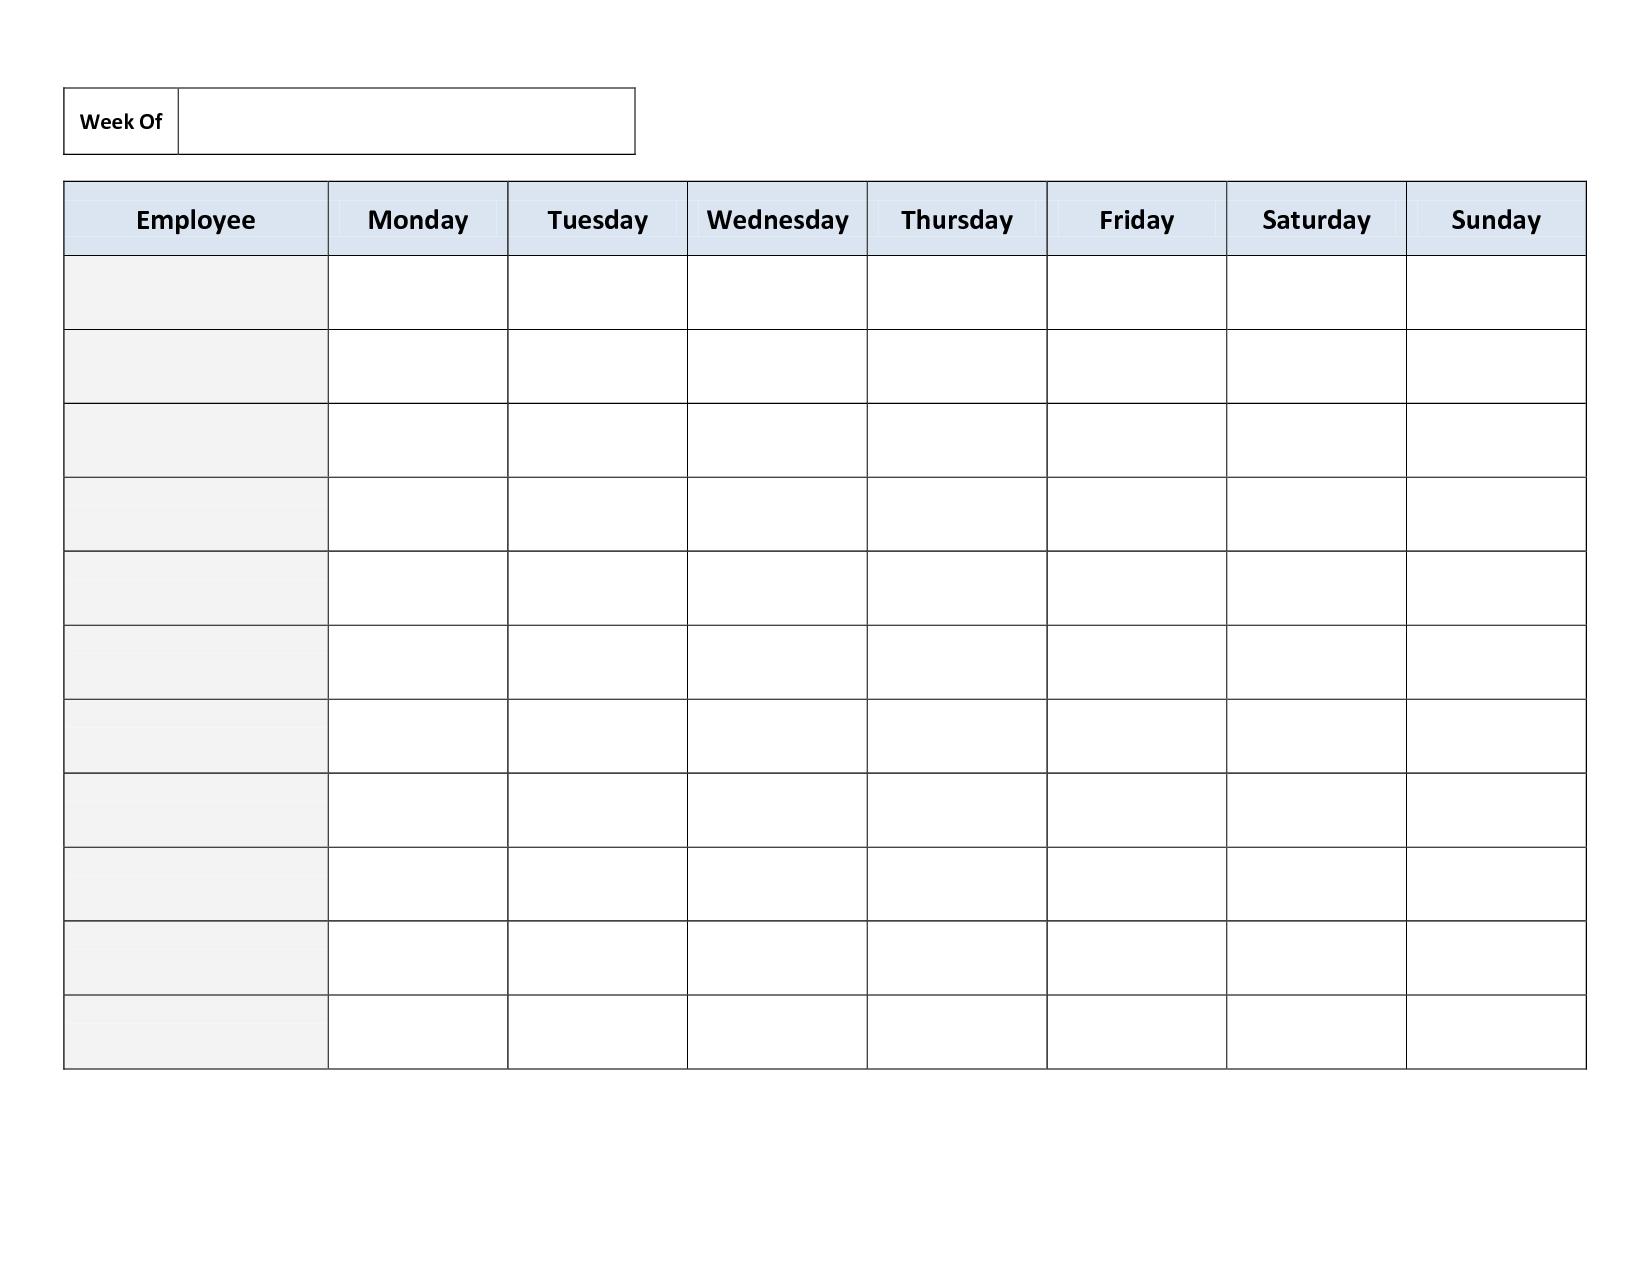 Weekly Employee Work Schedule Template. Free Blank Schedule.pdf - Free Printable Monthly Work Schedule Template